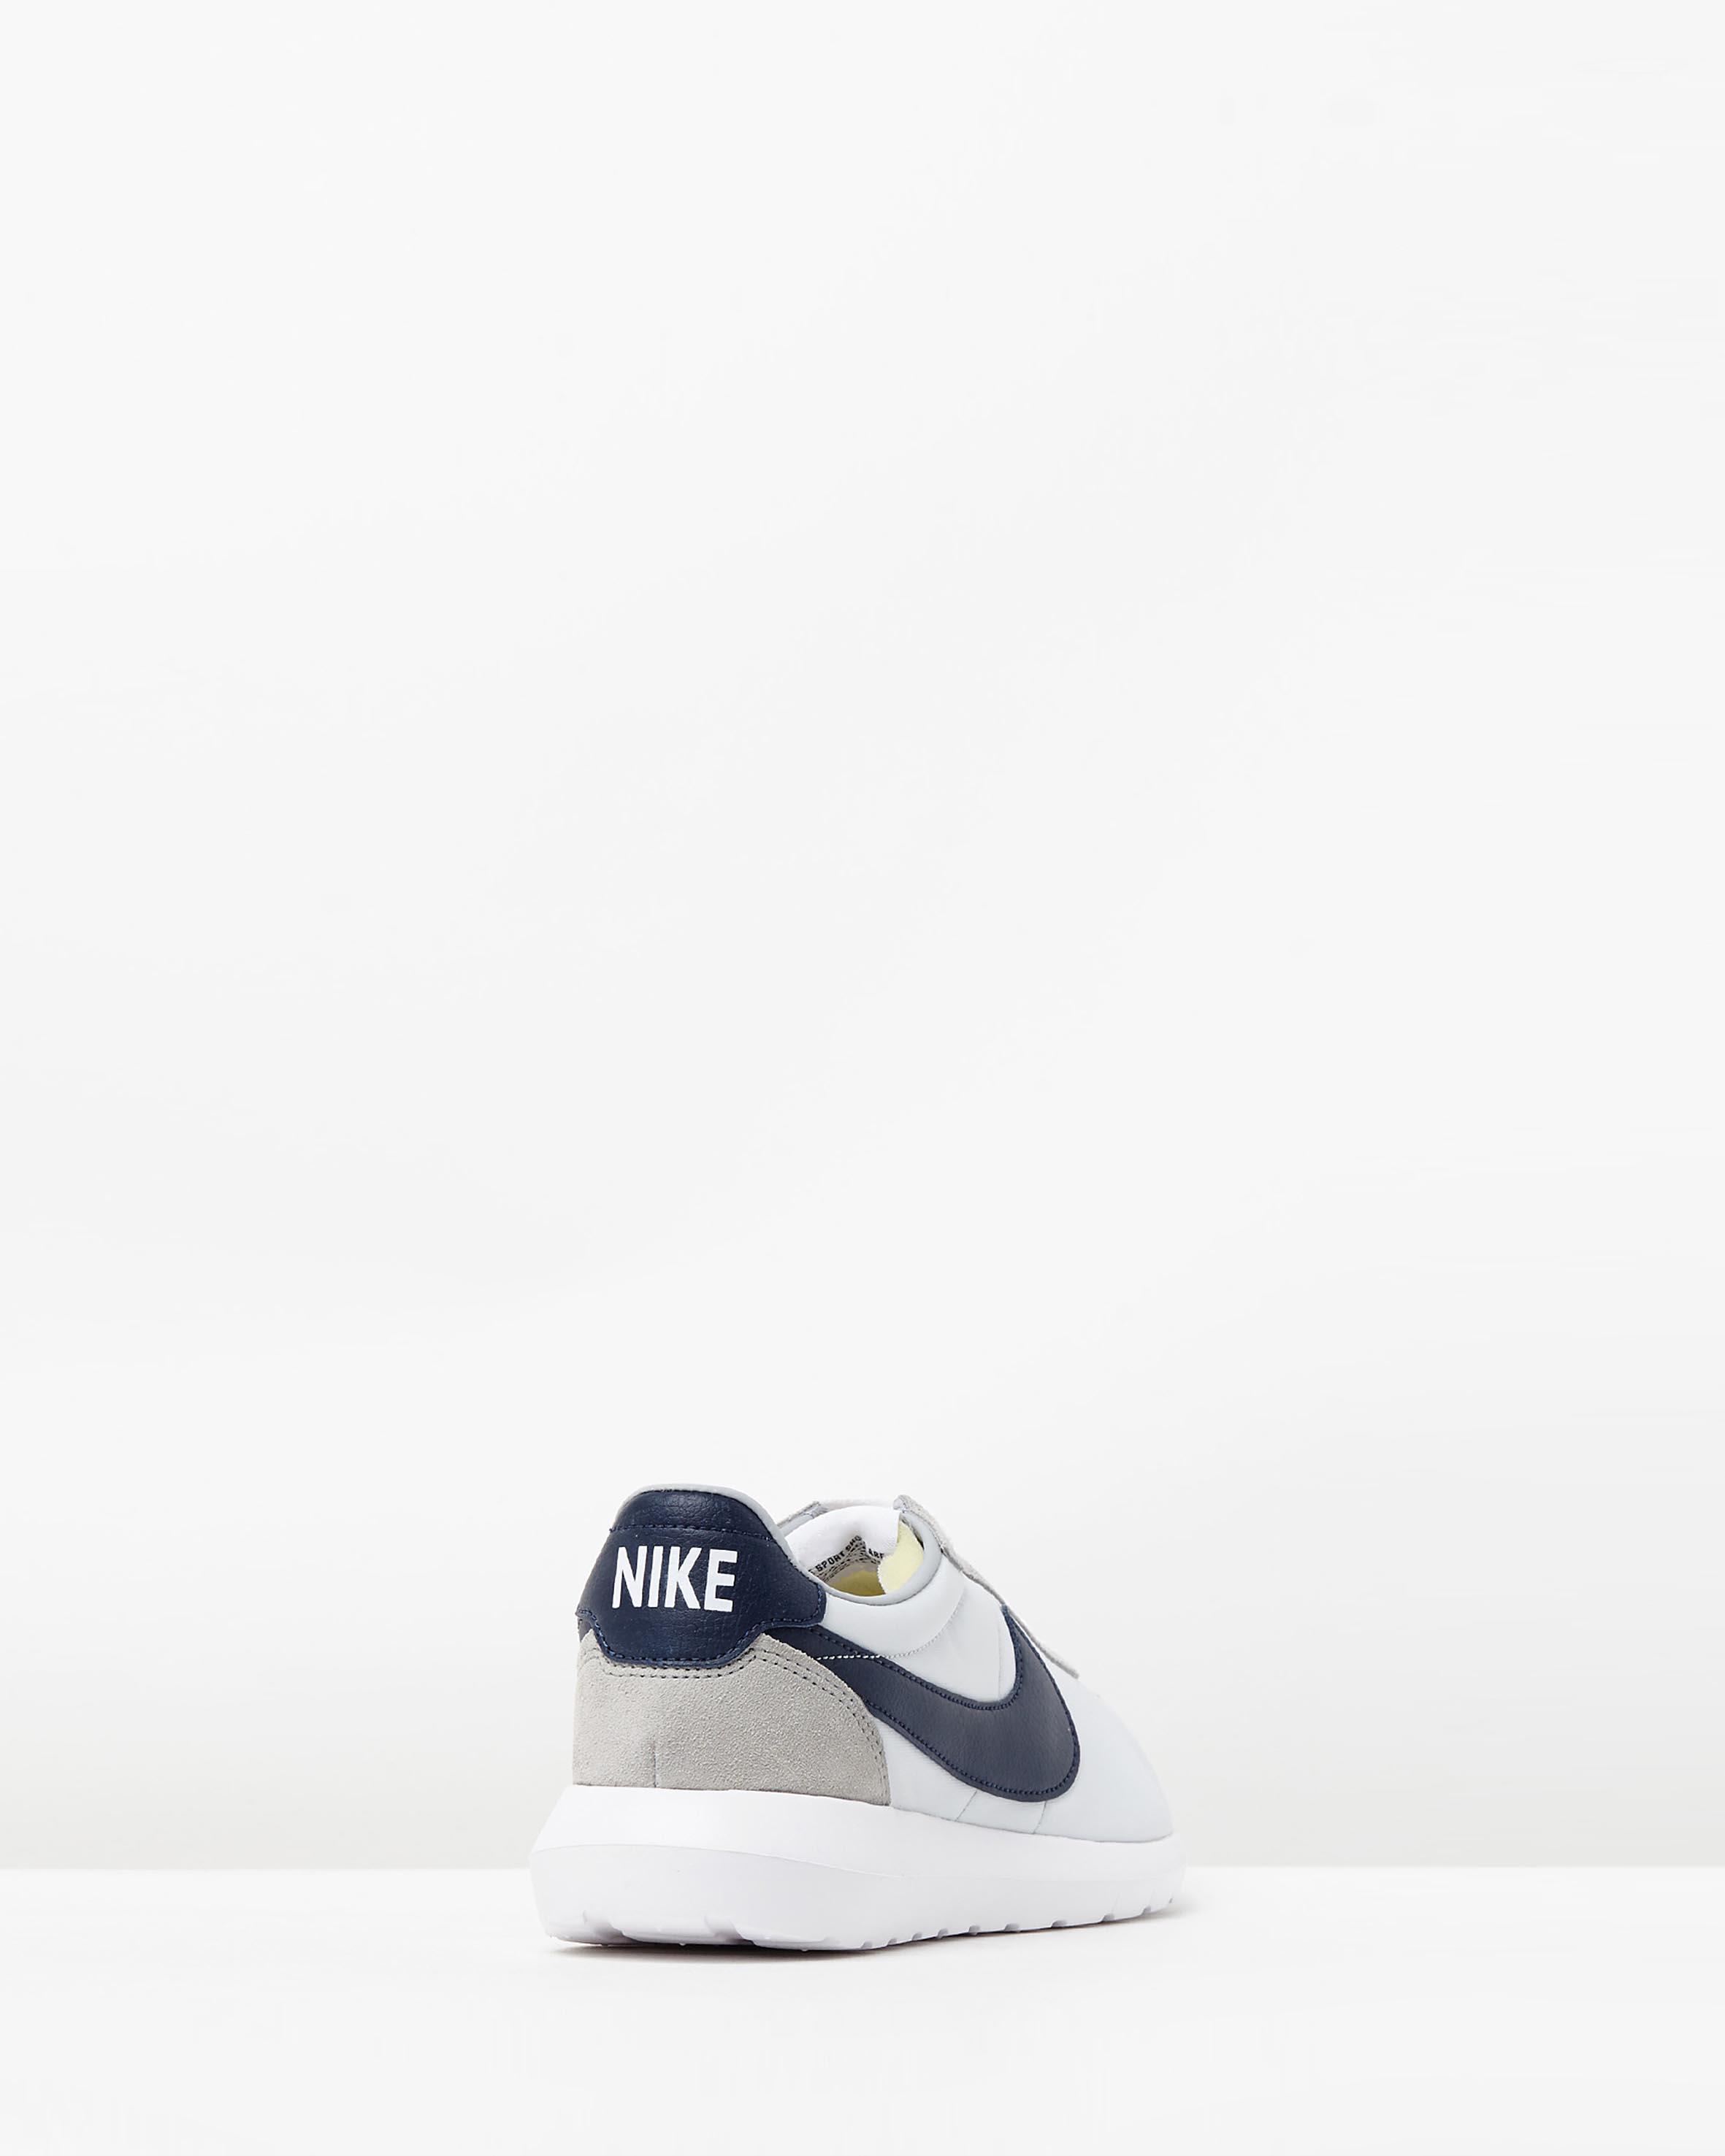 hot sale online 12111 88054 ... Nike Roshe LD 1000 QS Pure Platinum 2 ...